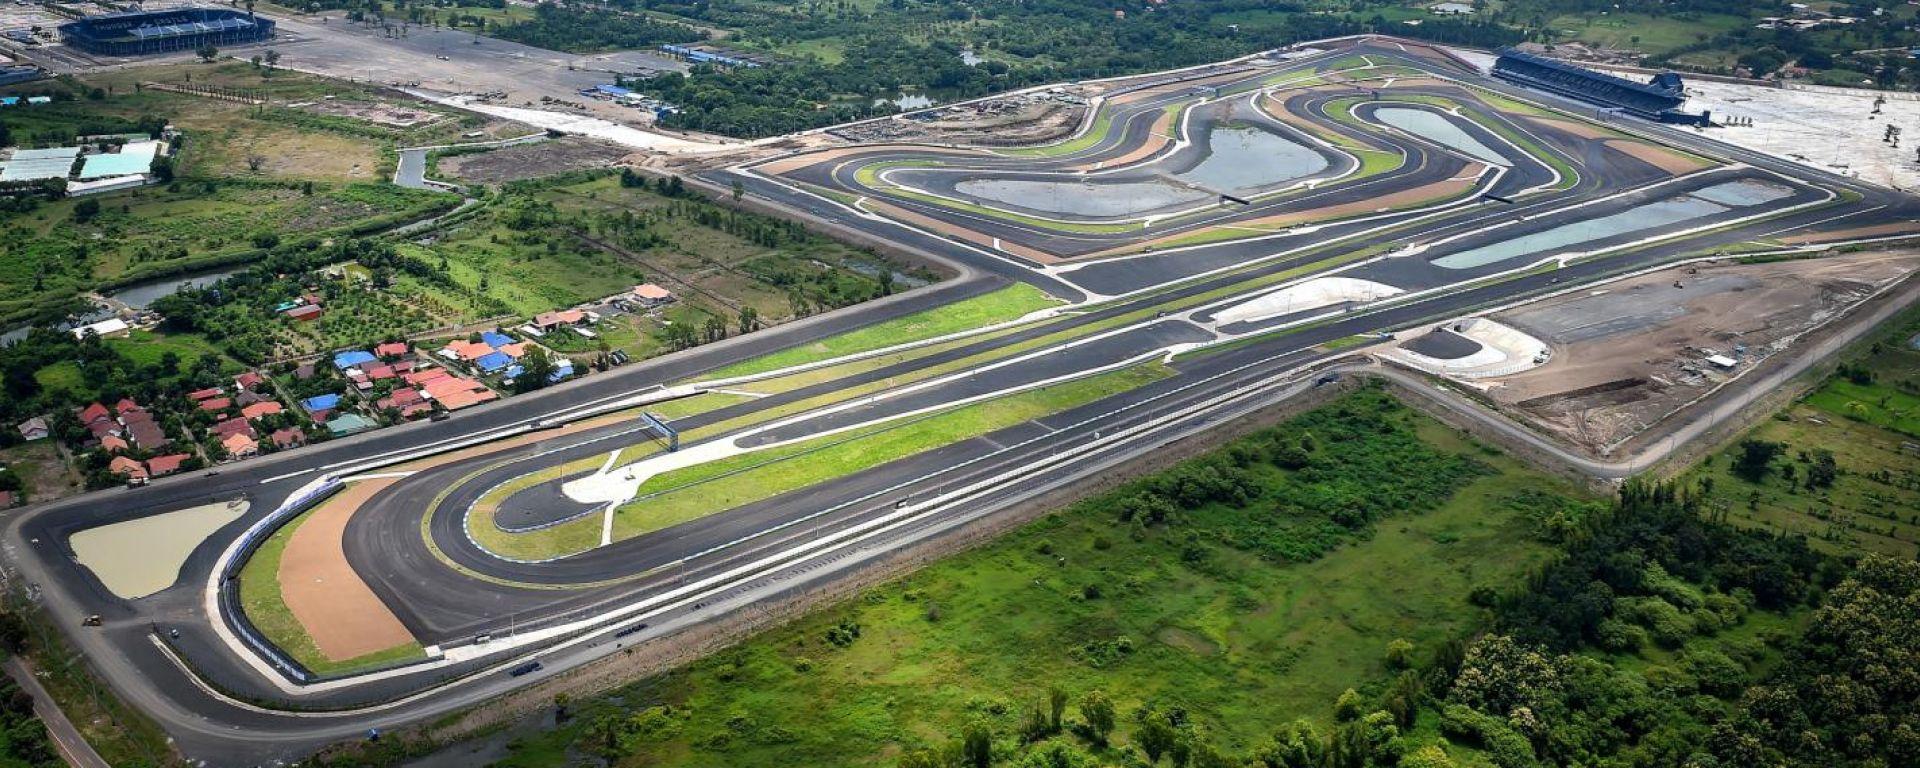 La pista di Buriram, Chang International Circuit, MotoGP Thailandia